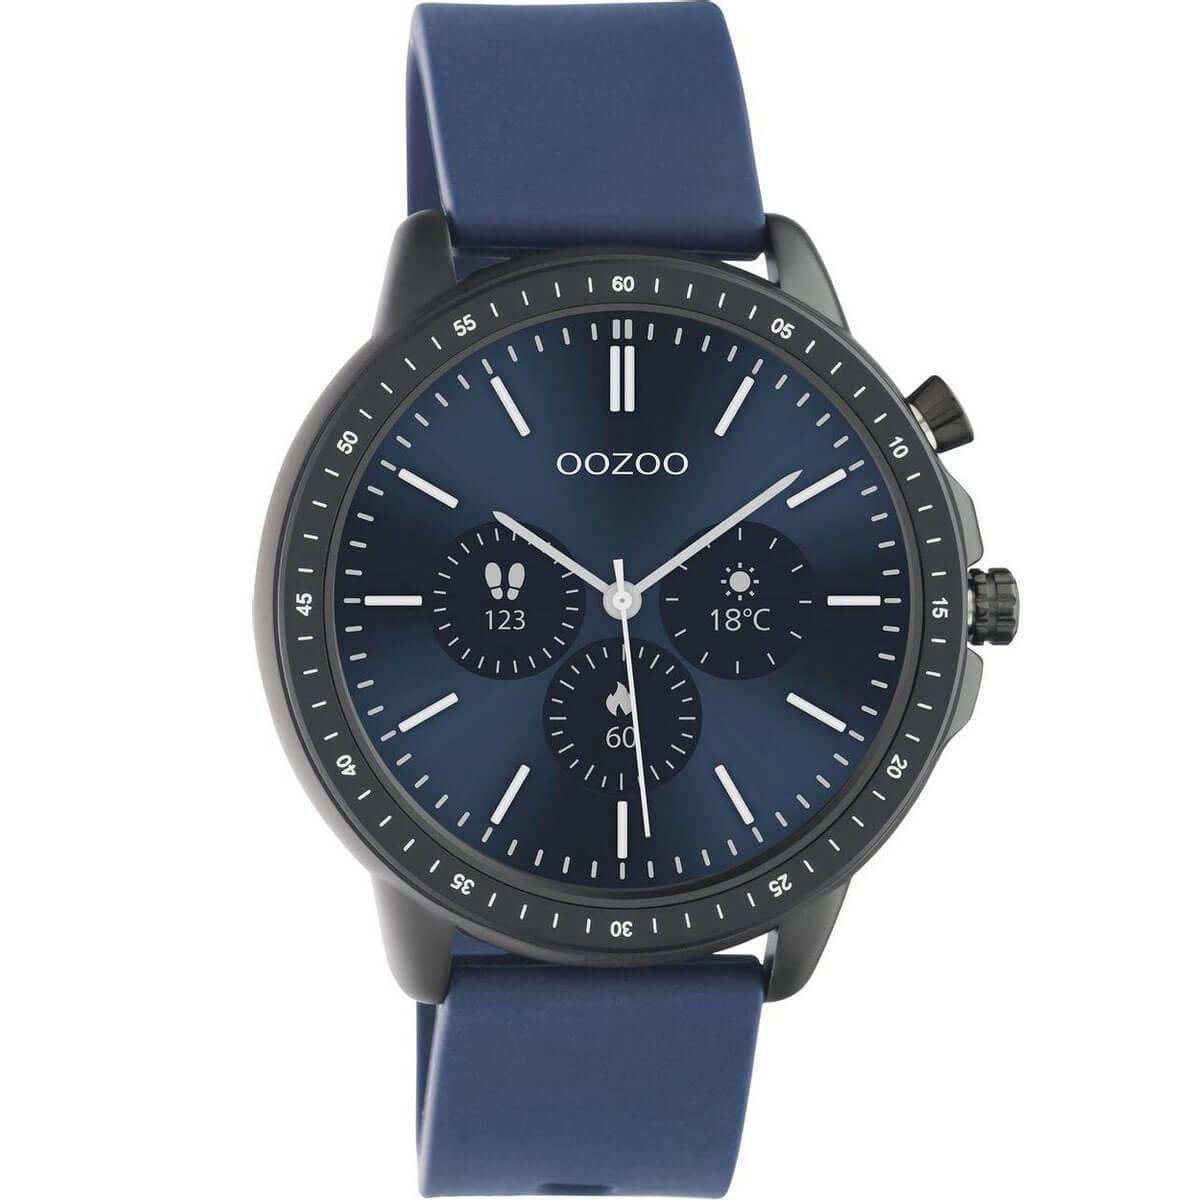 OOZOO Smartwatch Rubber Blauw/Zwart | Q00332